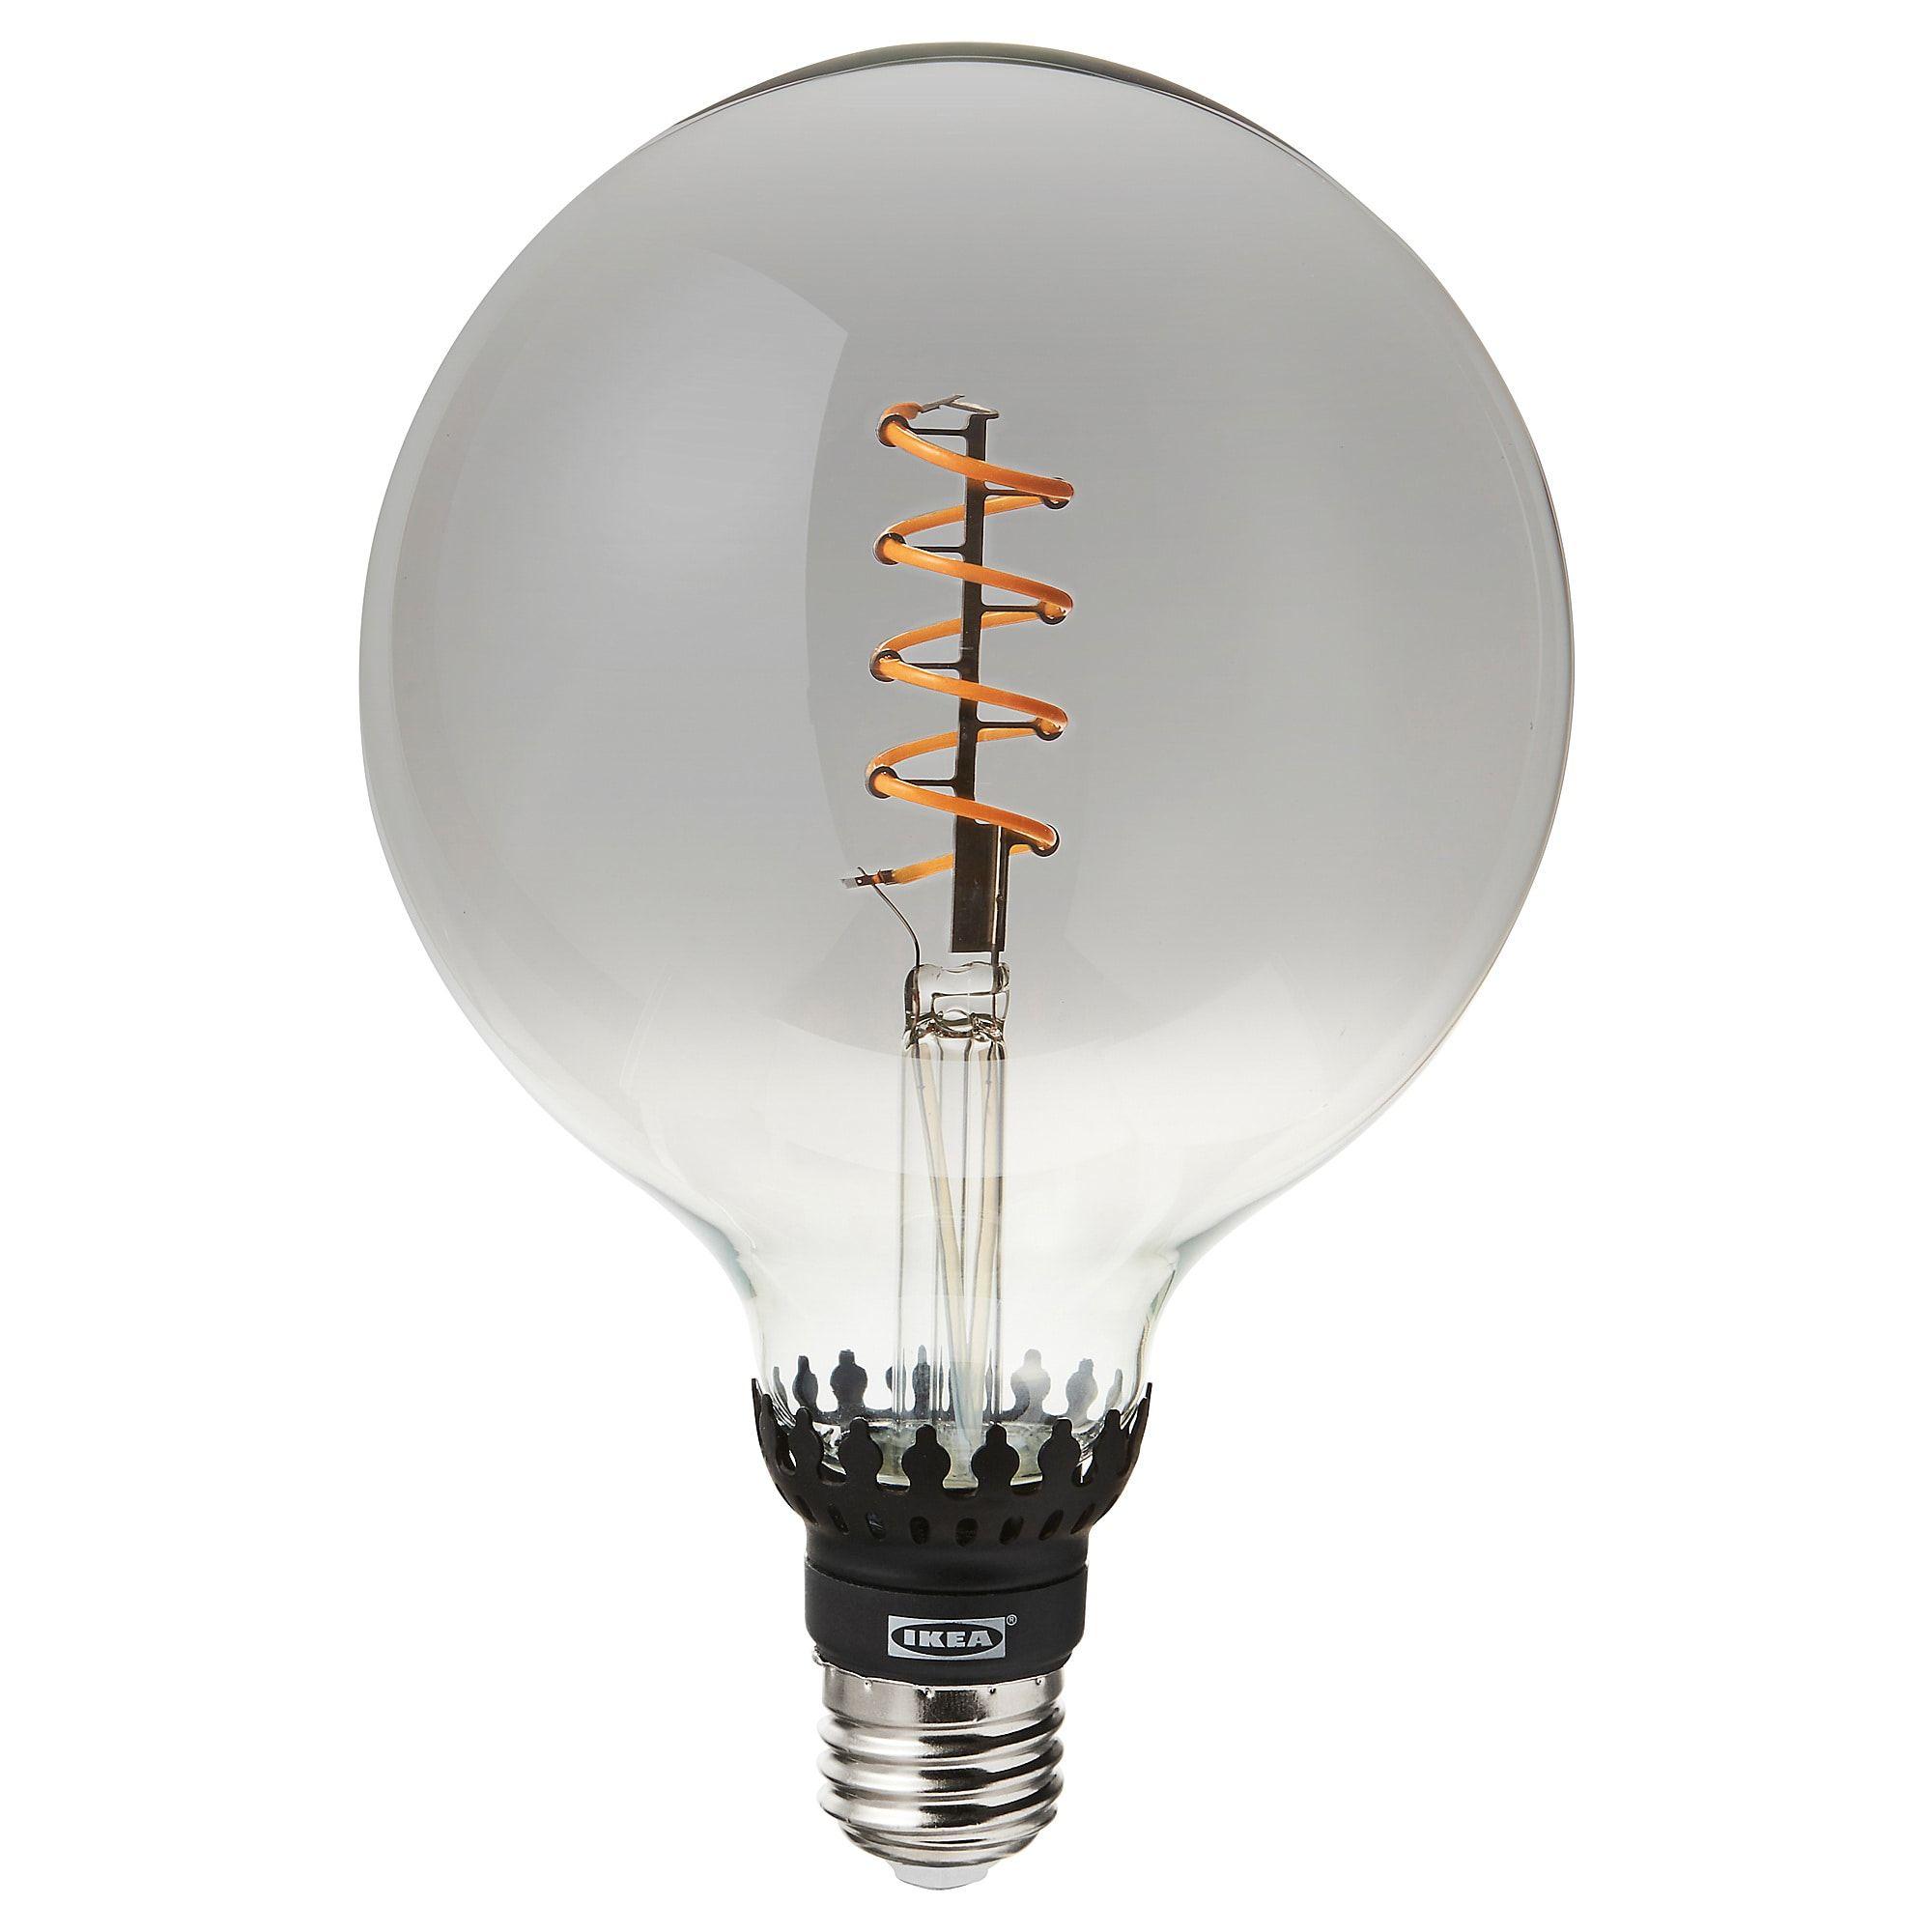 Rollsbo Led Leuchtmittel E27 200 Lm Dimmbar Rund Klarglas Grau Ikea Osterreich Lamp Bases Clear Glass Bulb